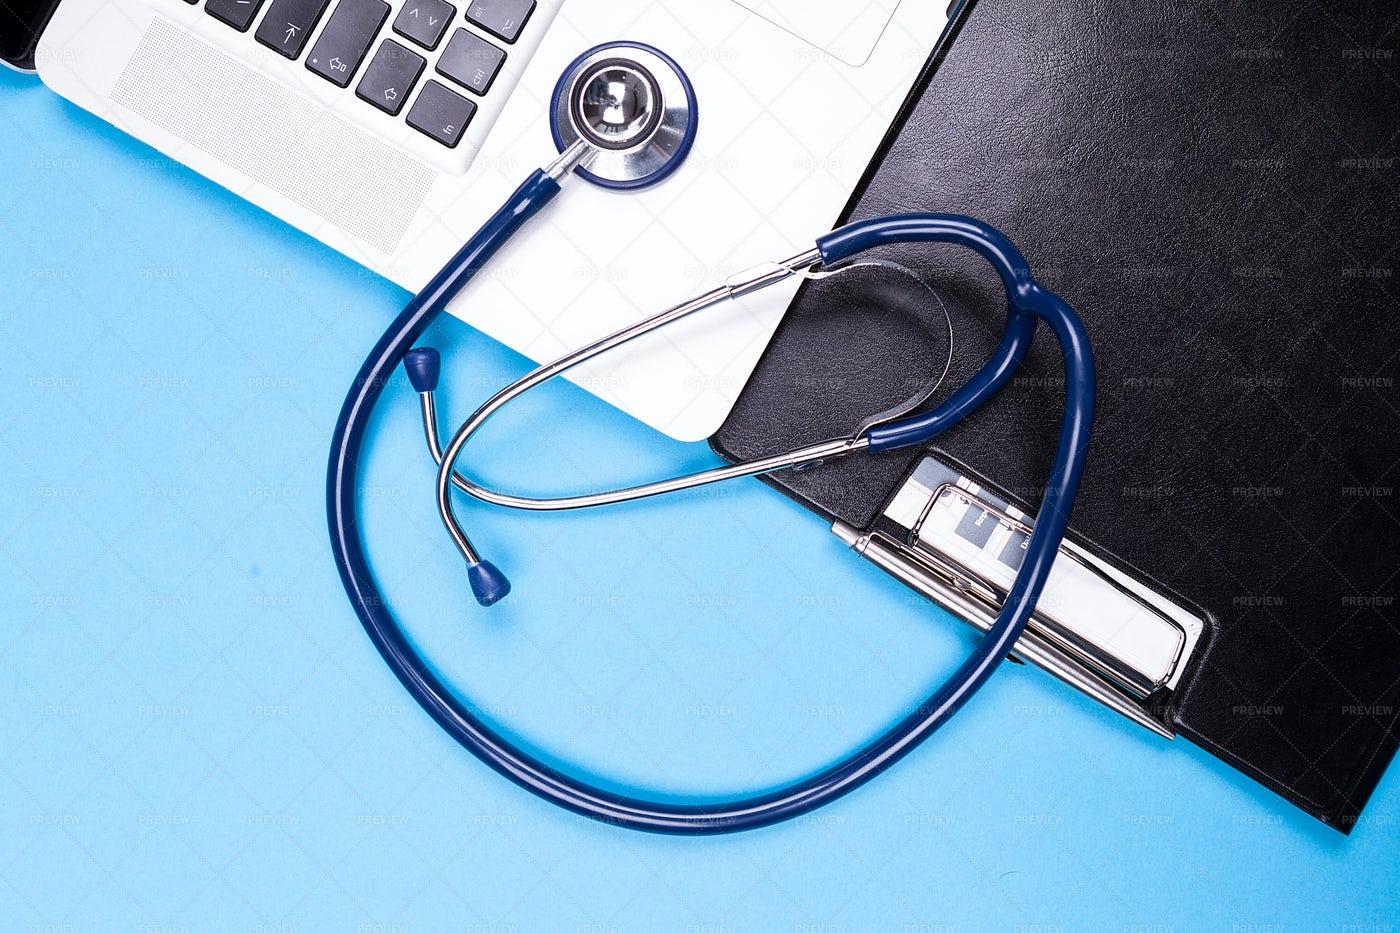 Stethoscope, Laptop And Folder: Stock Photos